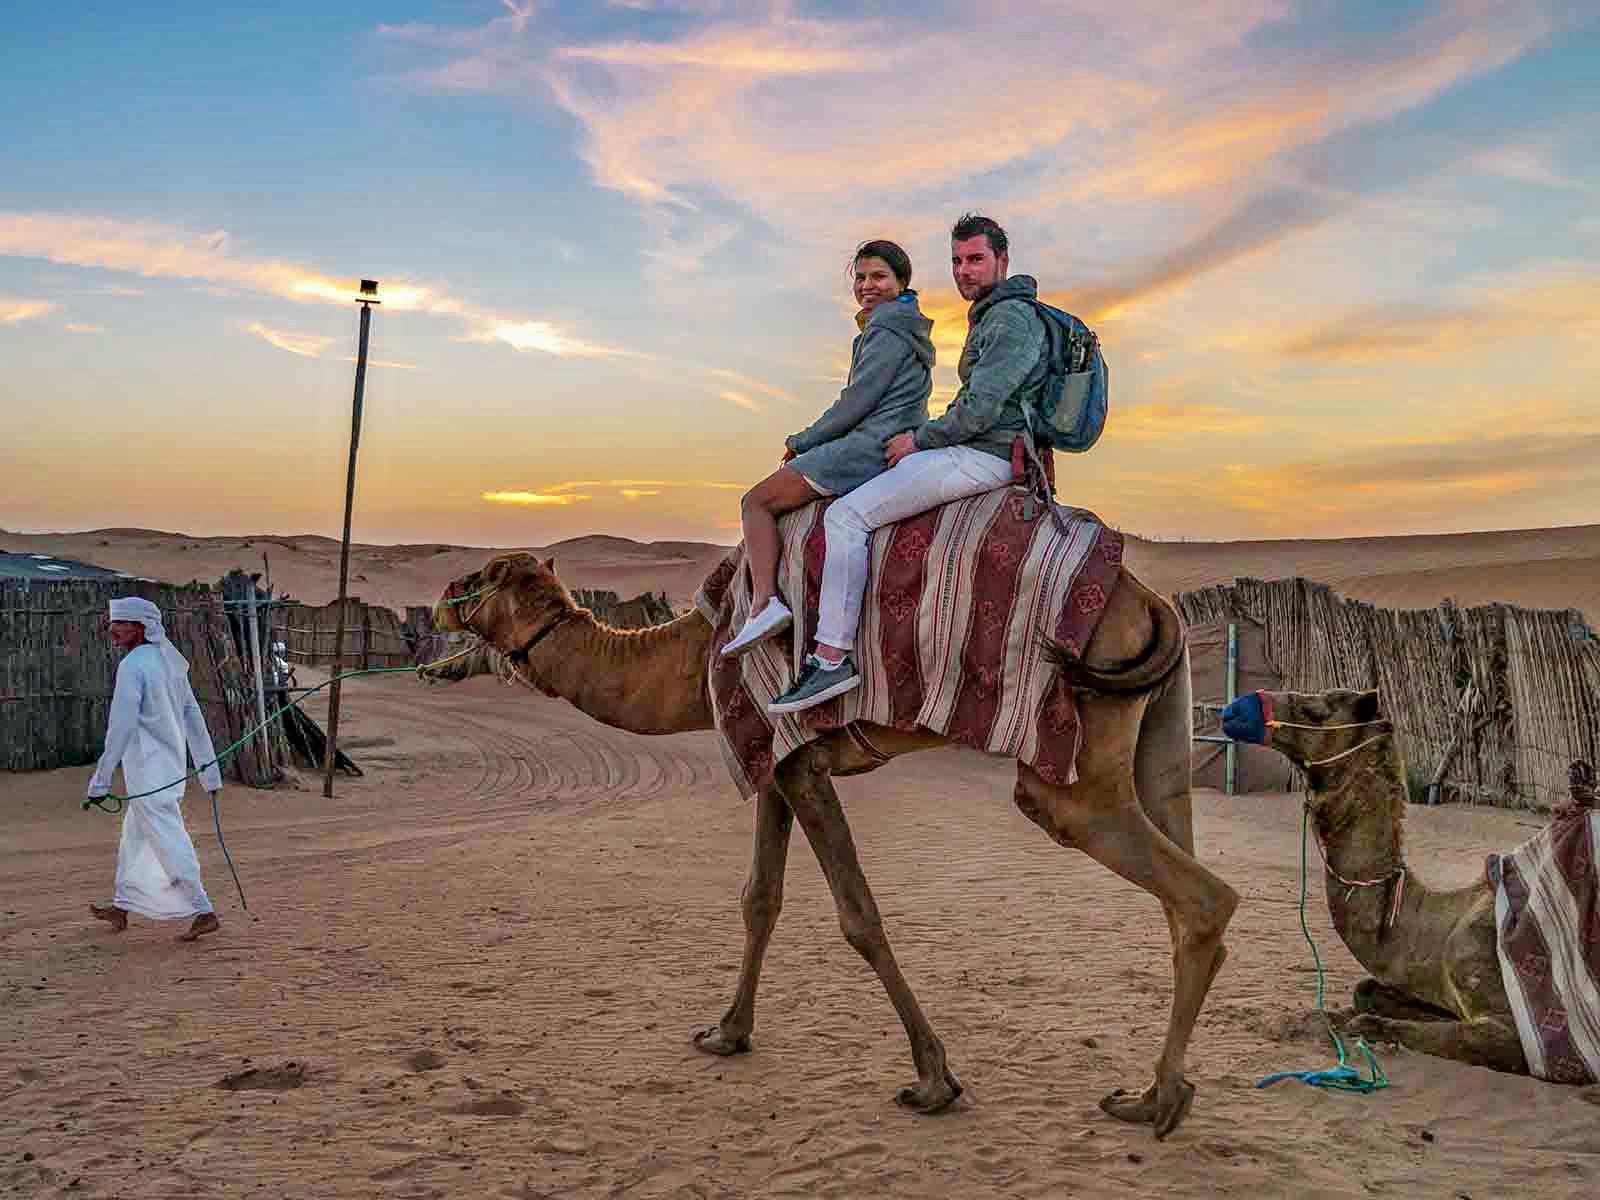 1511267101_camel-ride-dubai.jpg